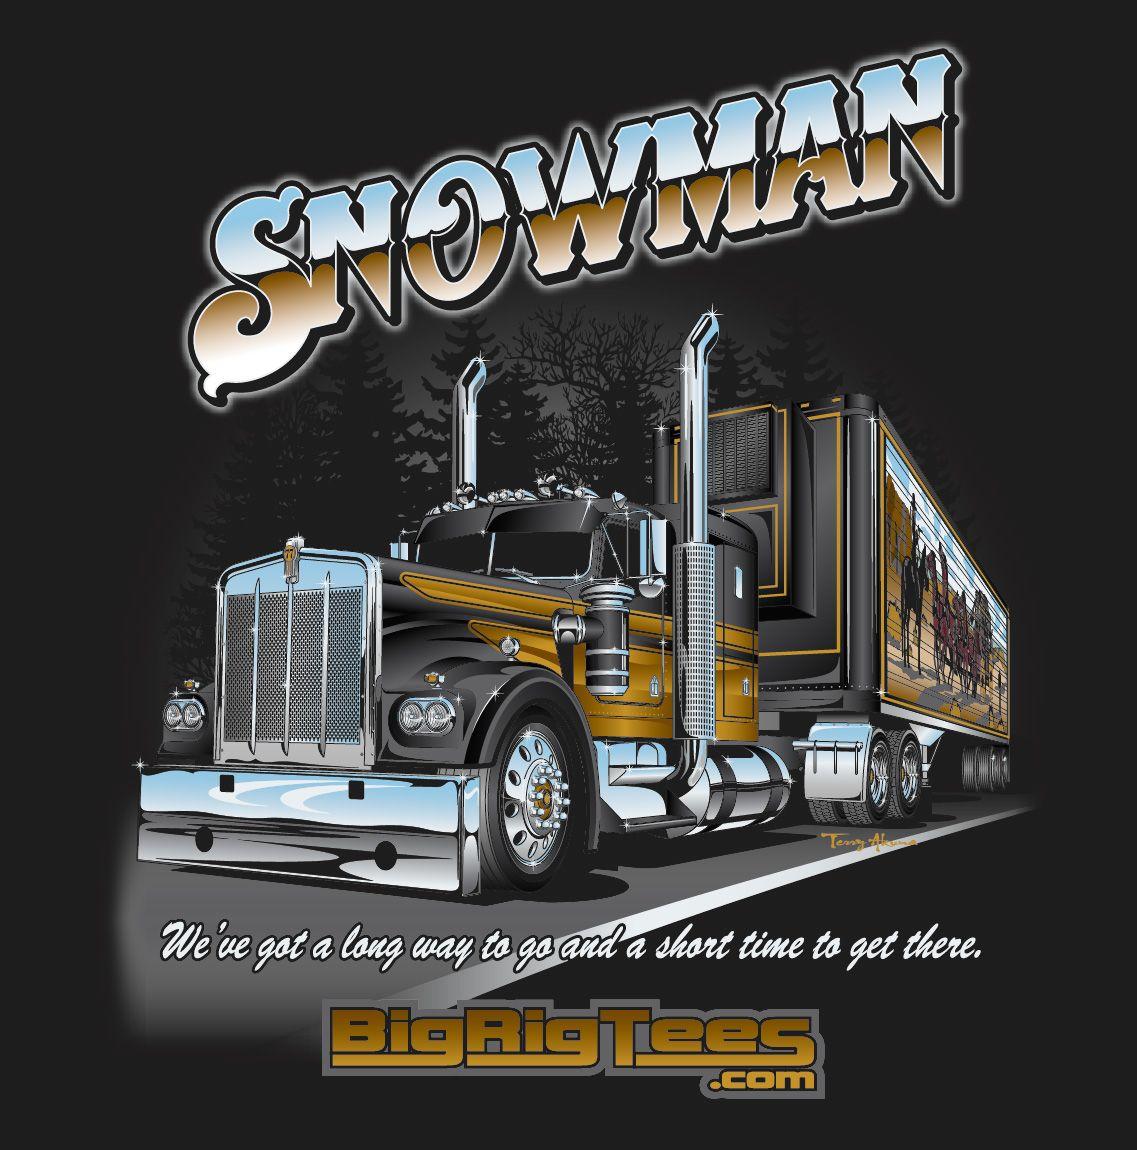 Snowman (Bandit). Back Tshirt design for BRT's retail